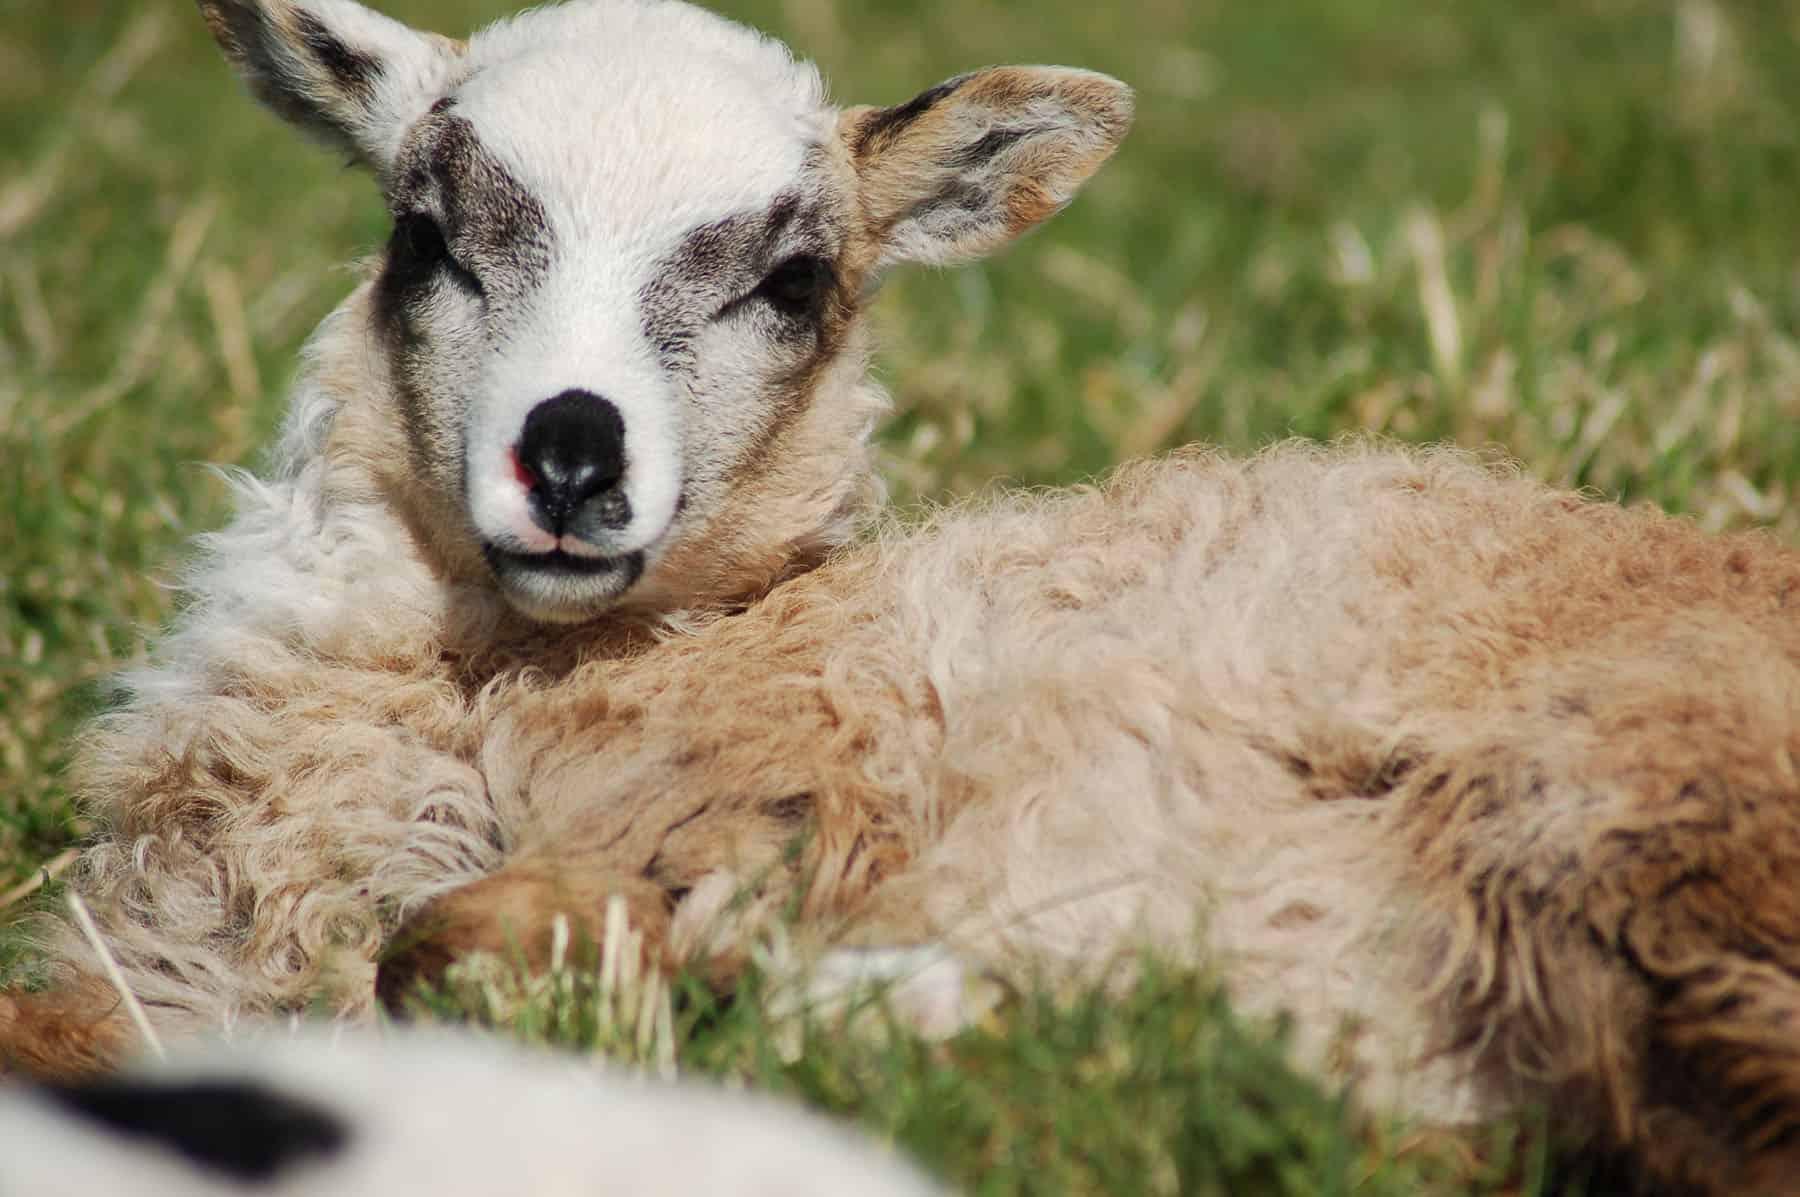 patchwork sheep beautiful smudge cute lamb golden soay cross shetland jacob sheep